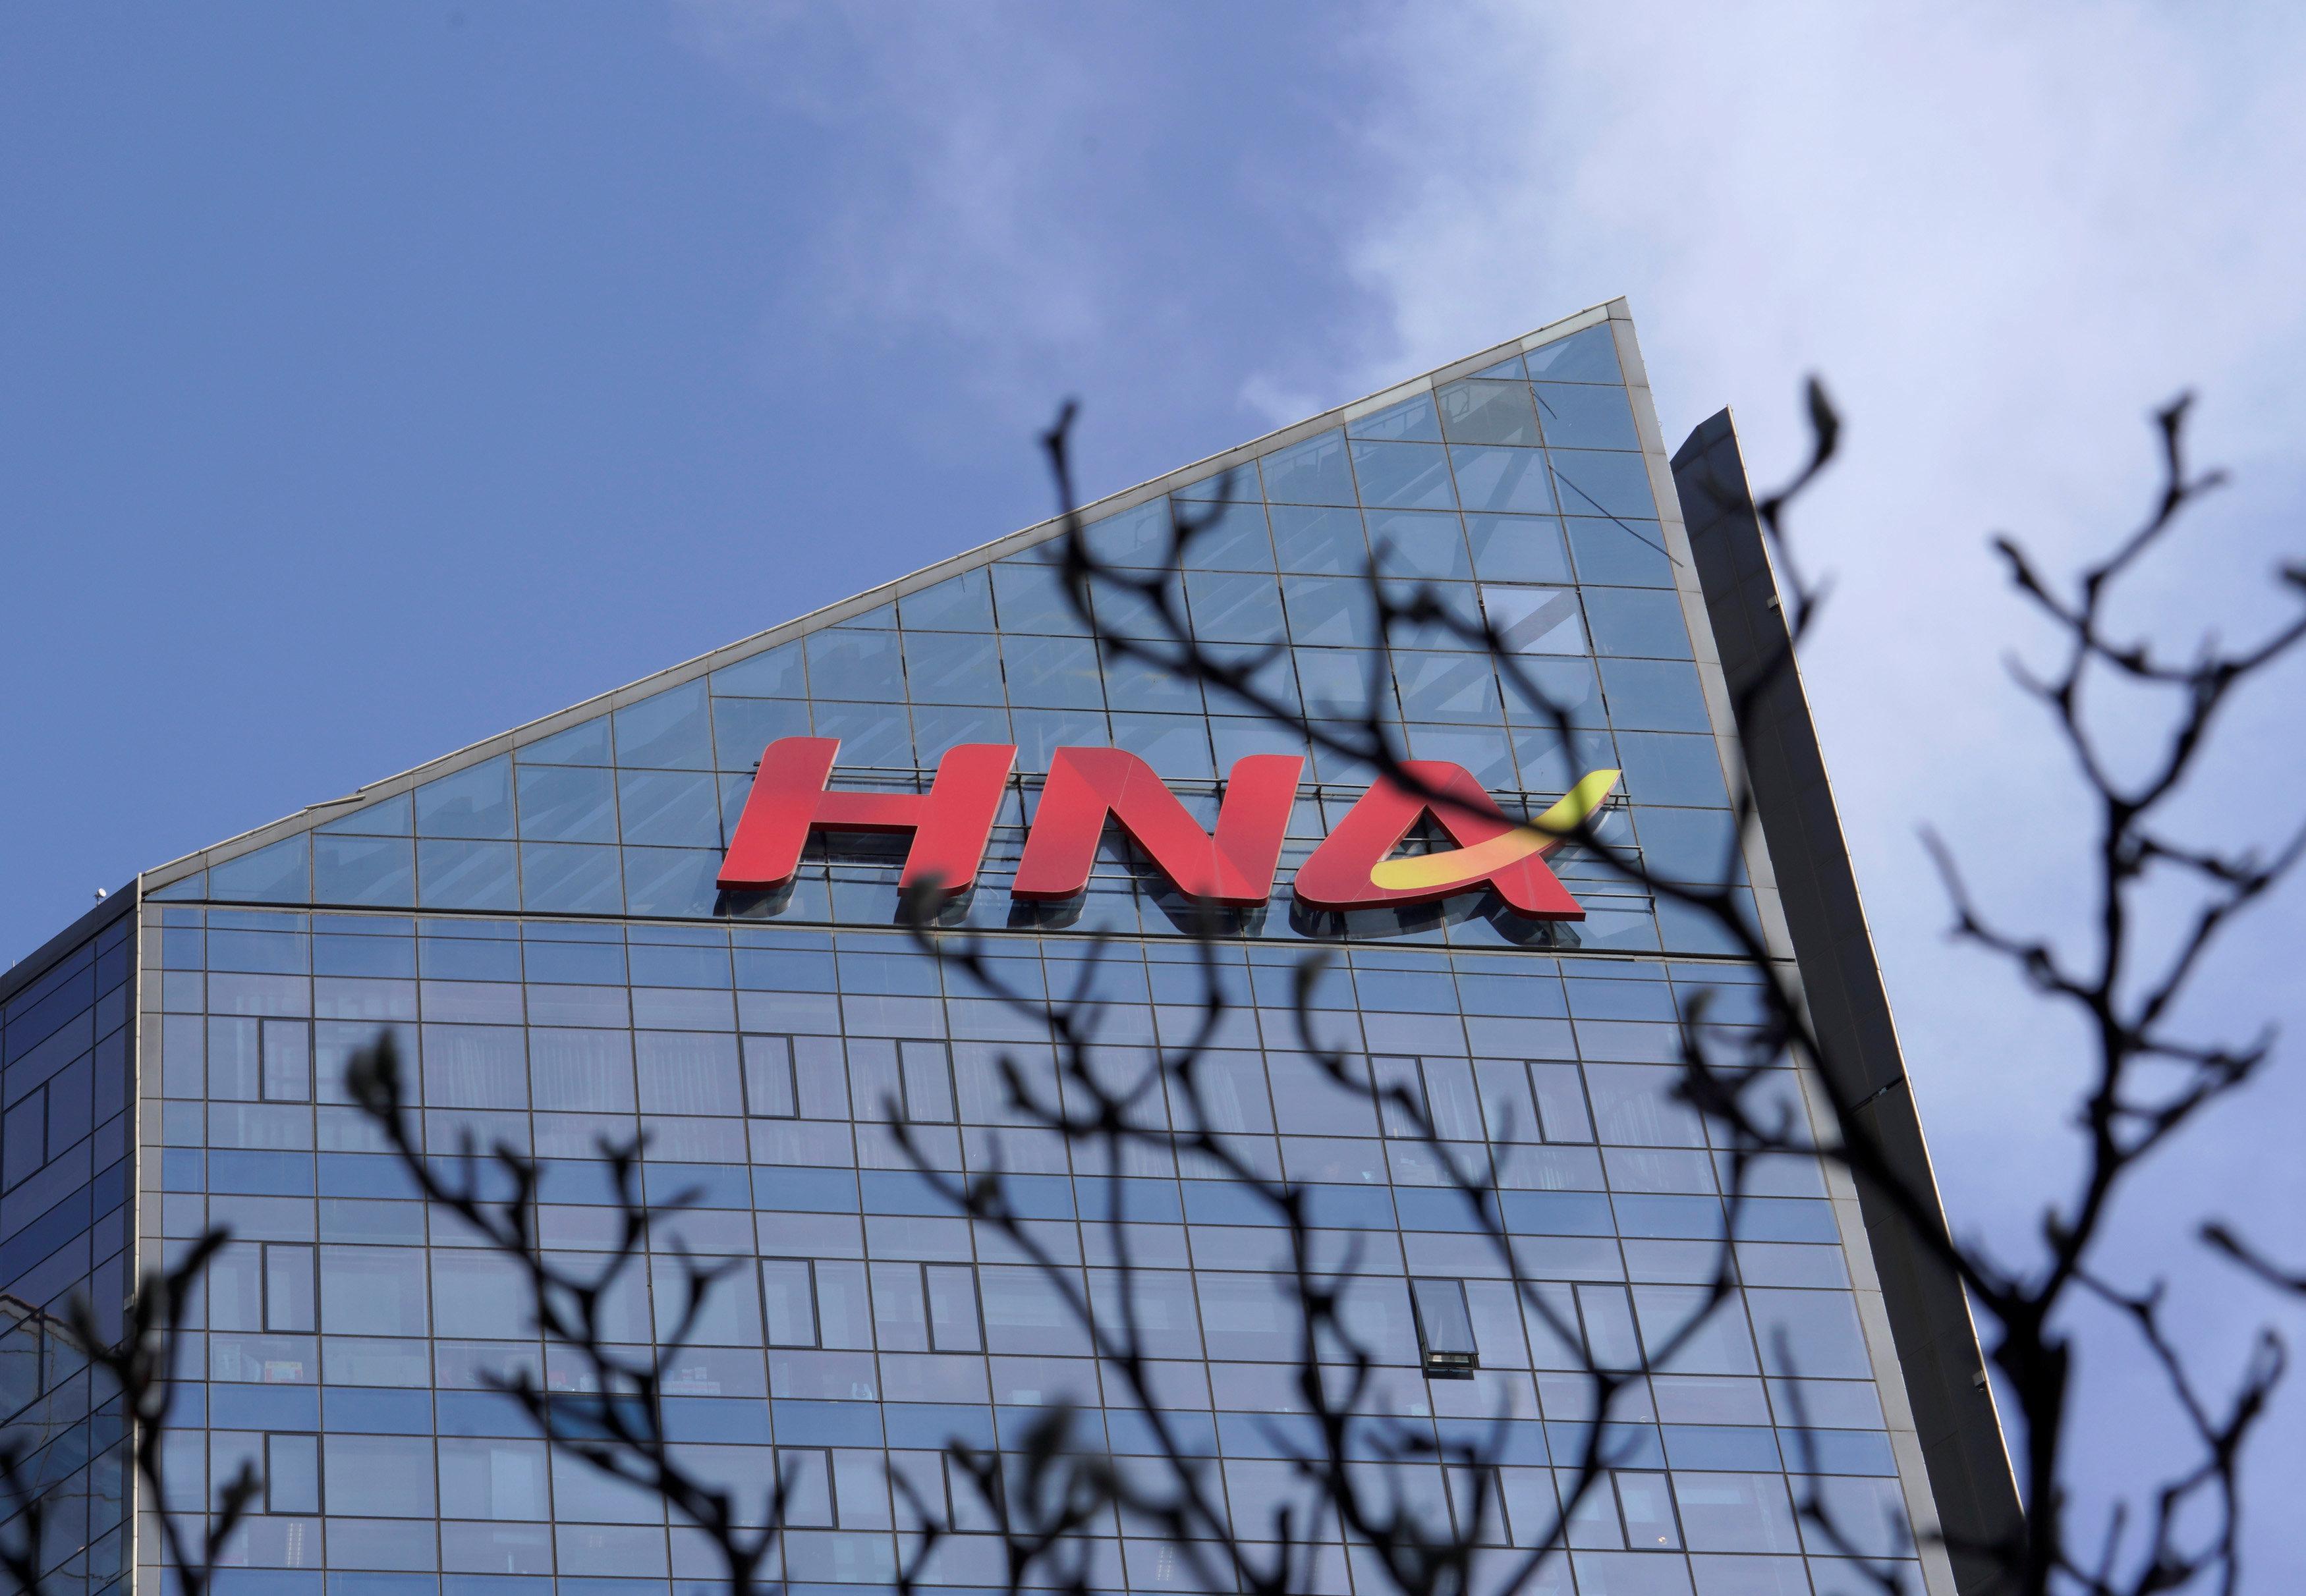 HNA Plaza in Beijing, China on Feb. 9, 2018. Photo: VCG